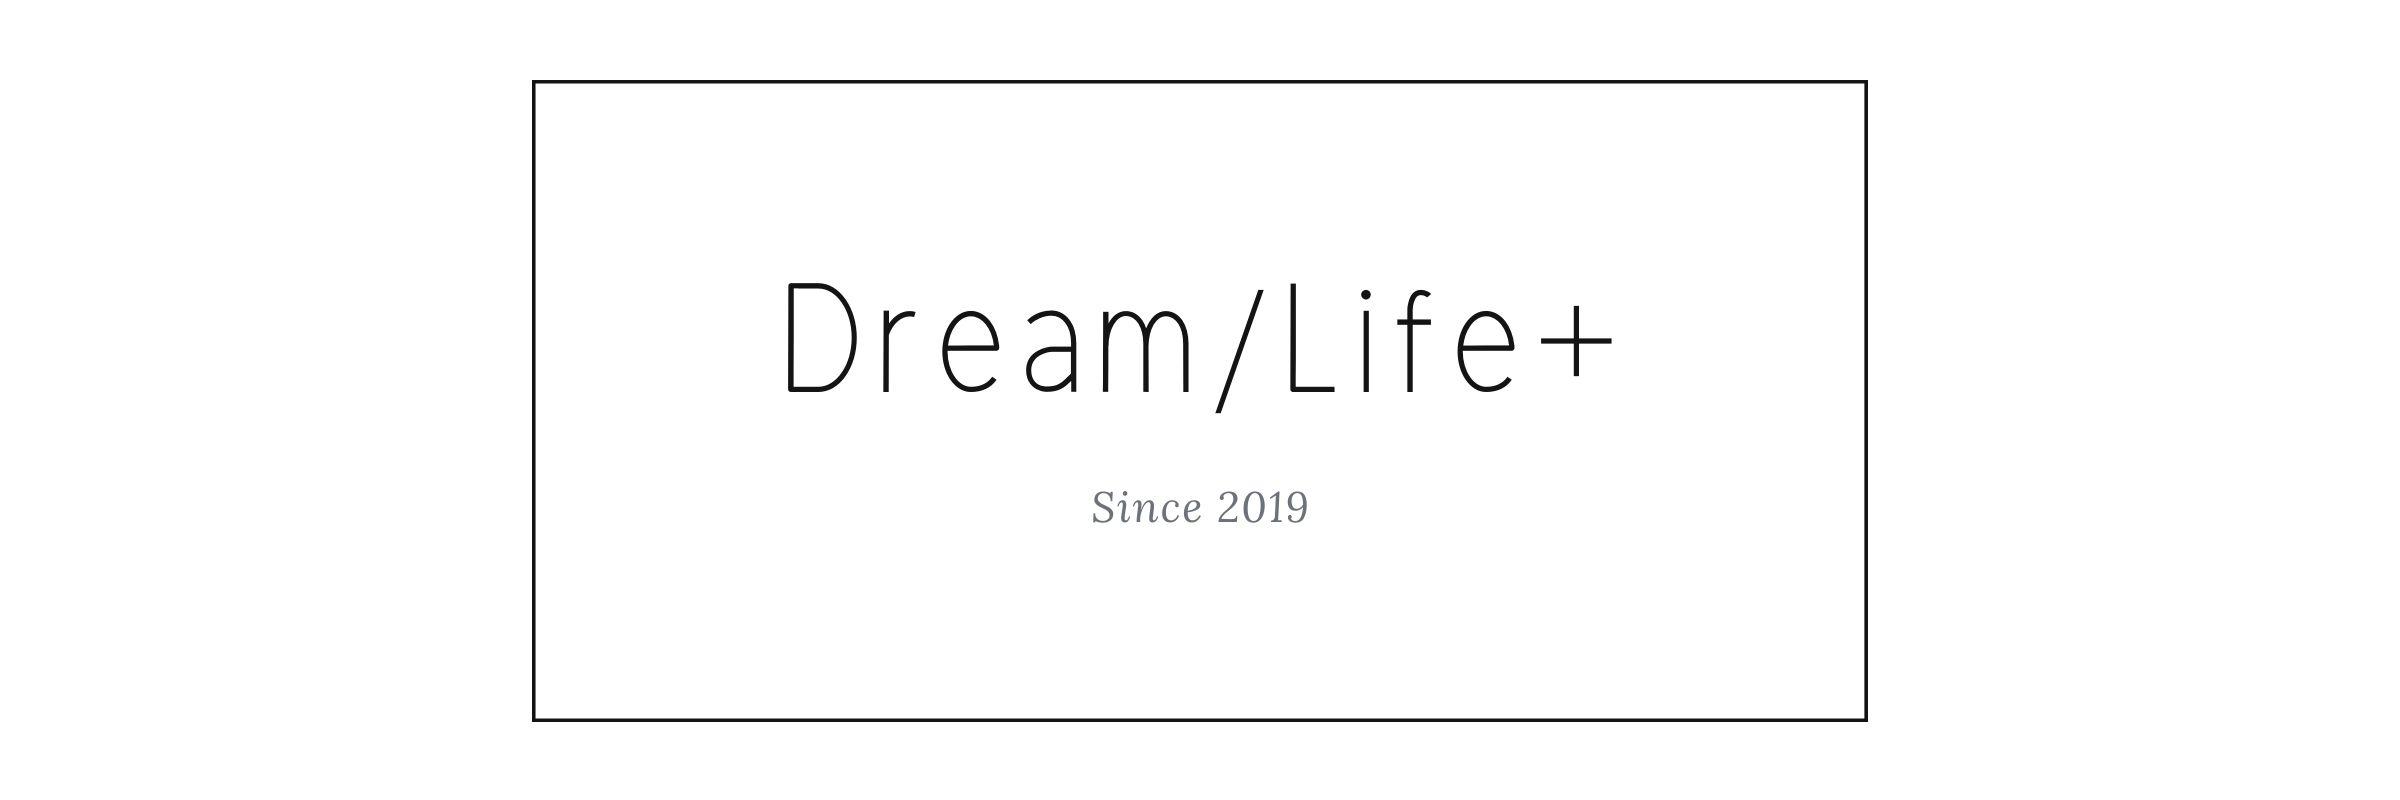 Dream/Life+